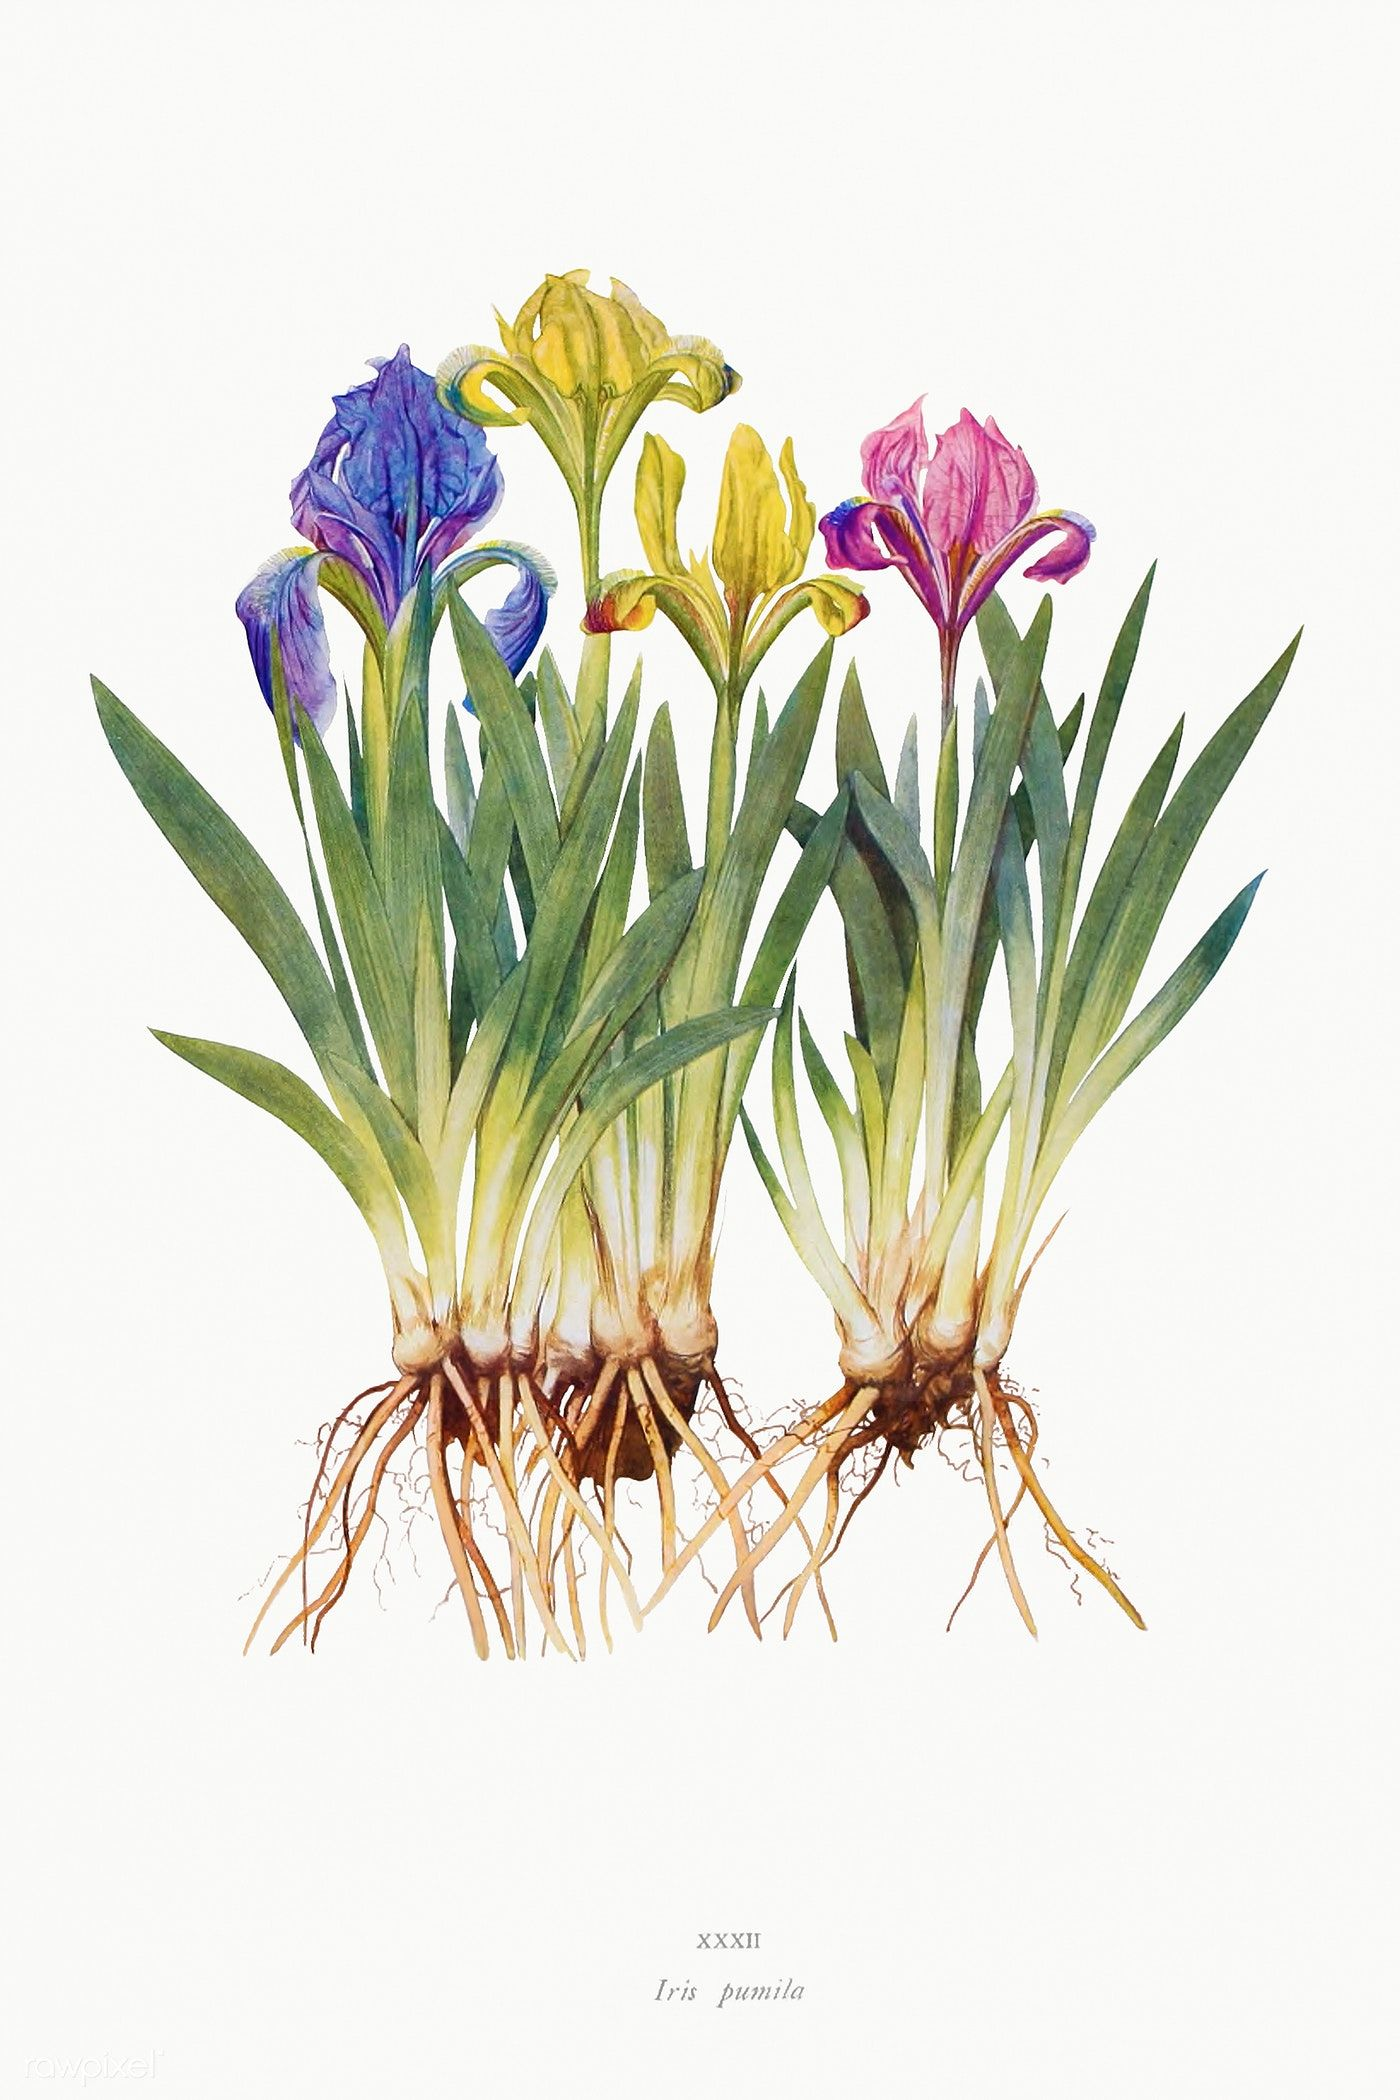 Iris Pumila From The Genus Iris By William Rickatson Dykes 1877 1925 Original From The Biodiversity In 2020 Flower Illustration Iris Flowers Botanical Illustration